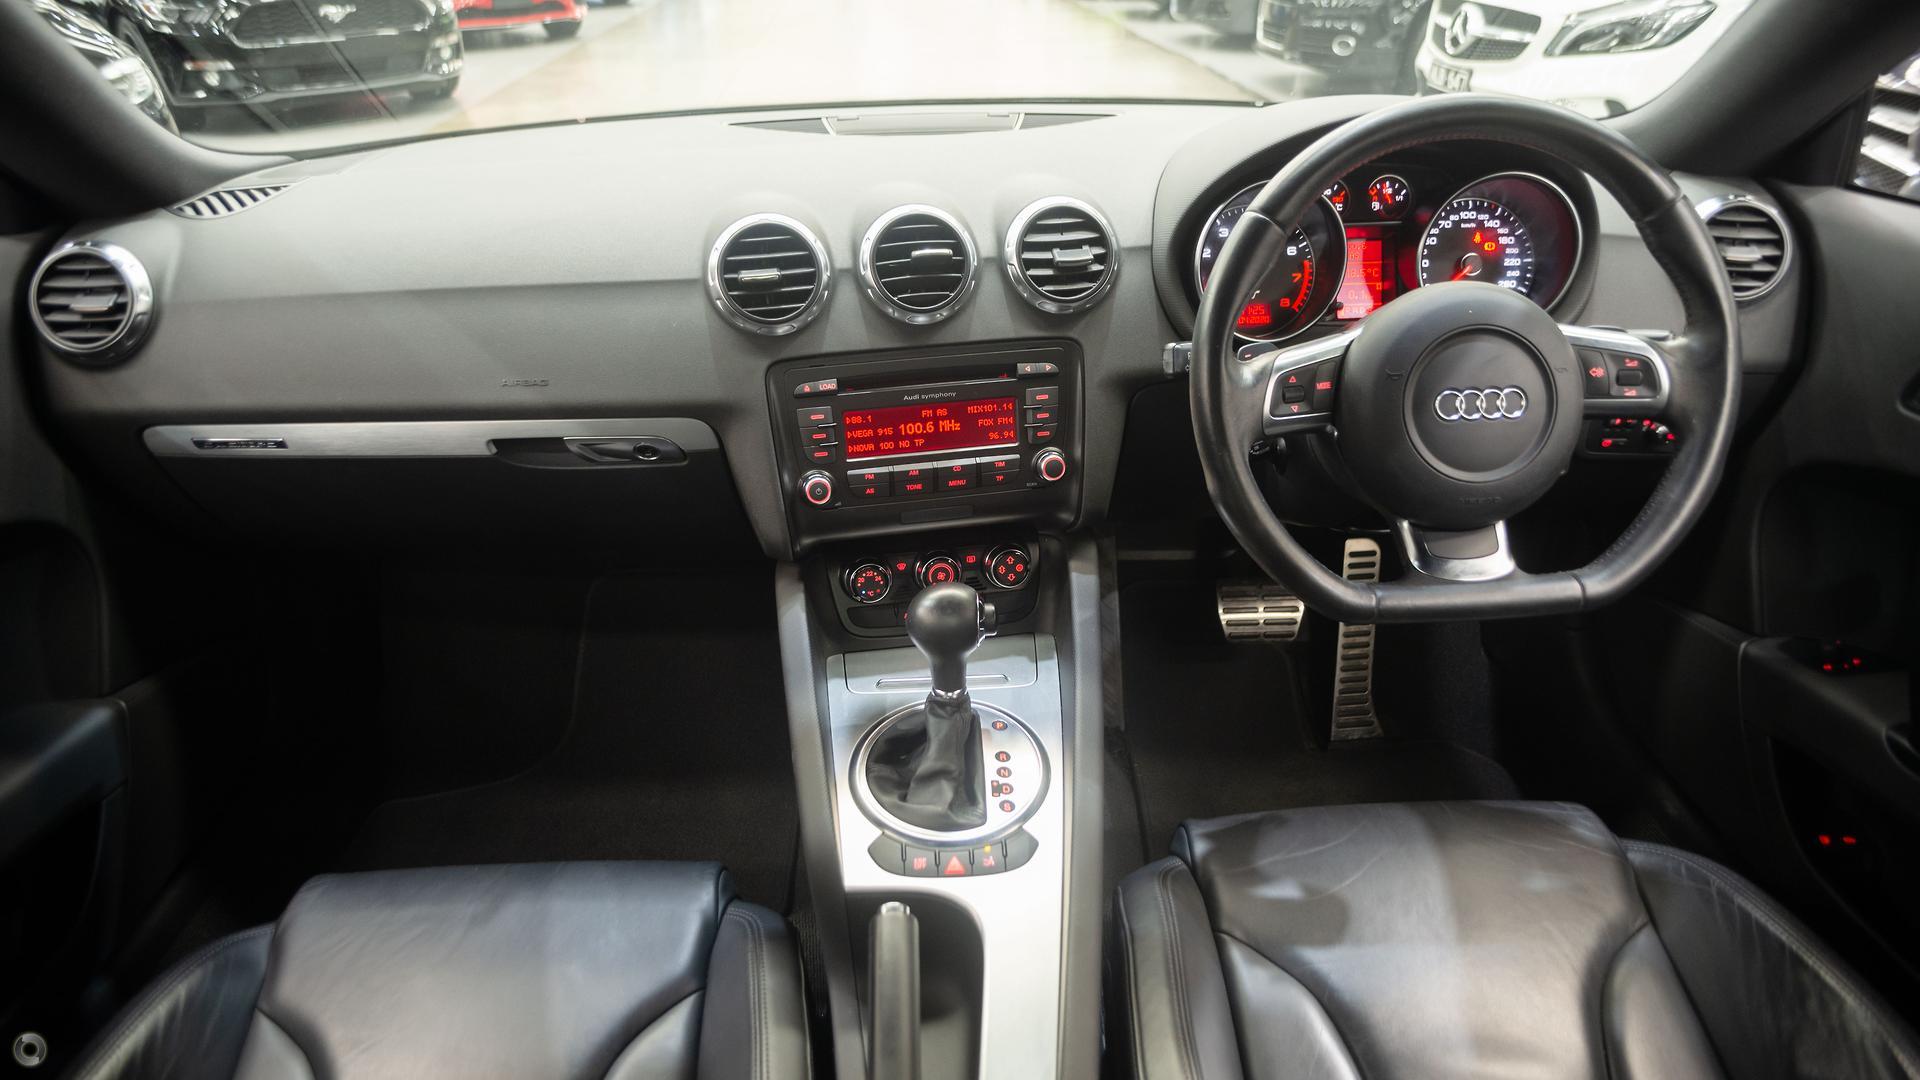 2007 Audi TT  8J